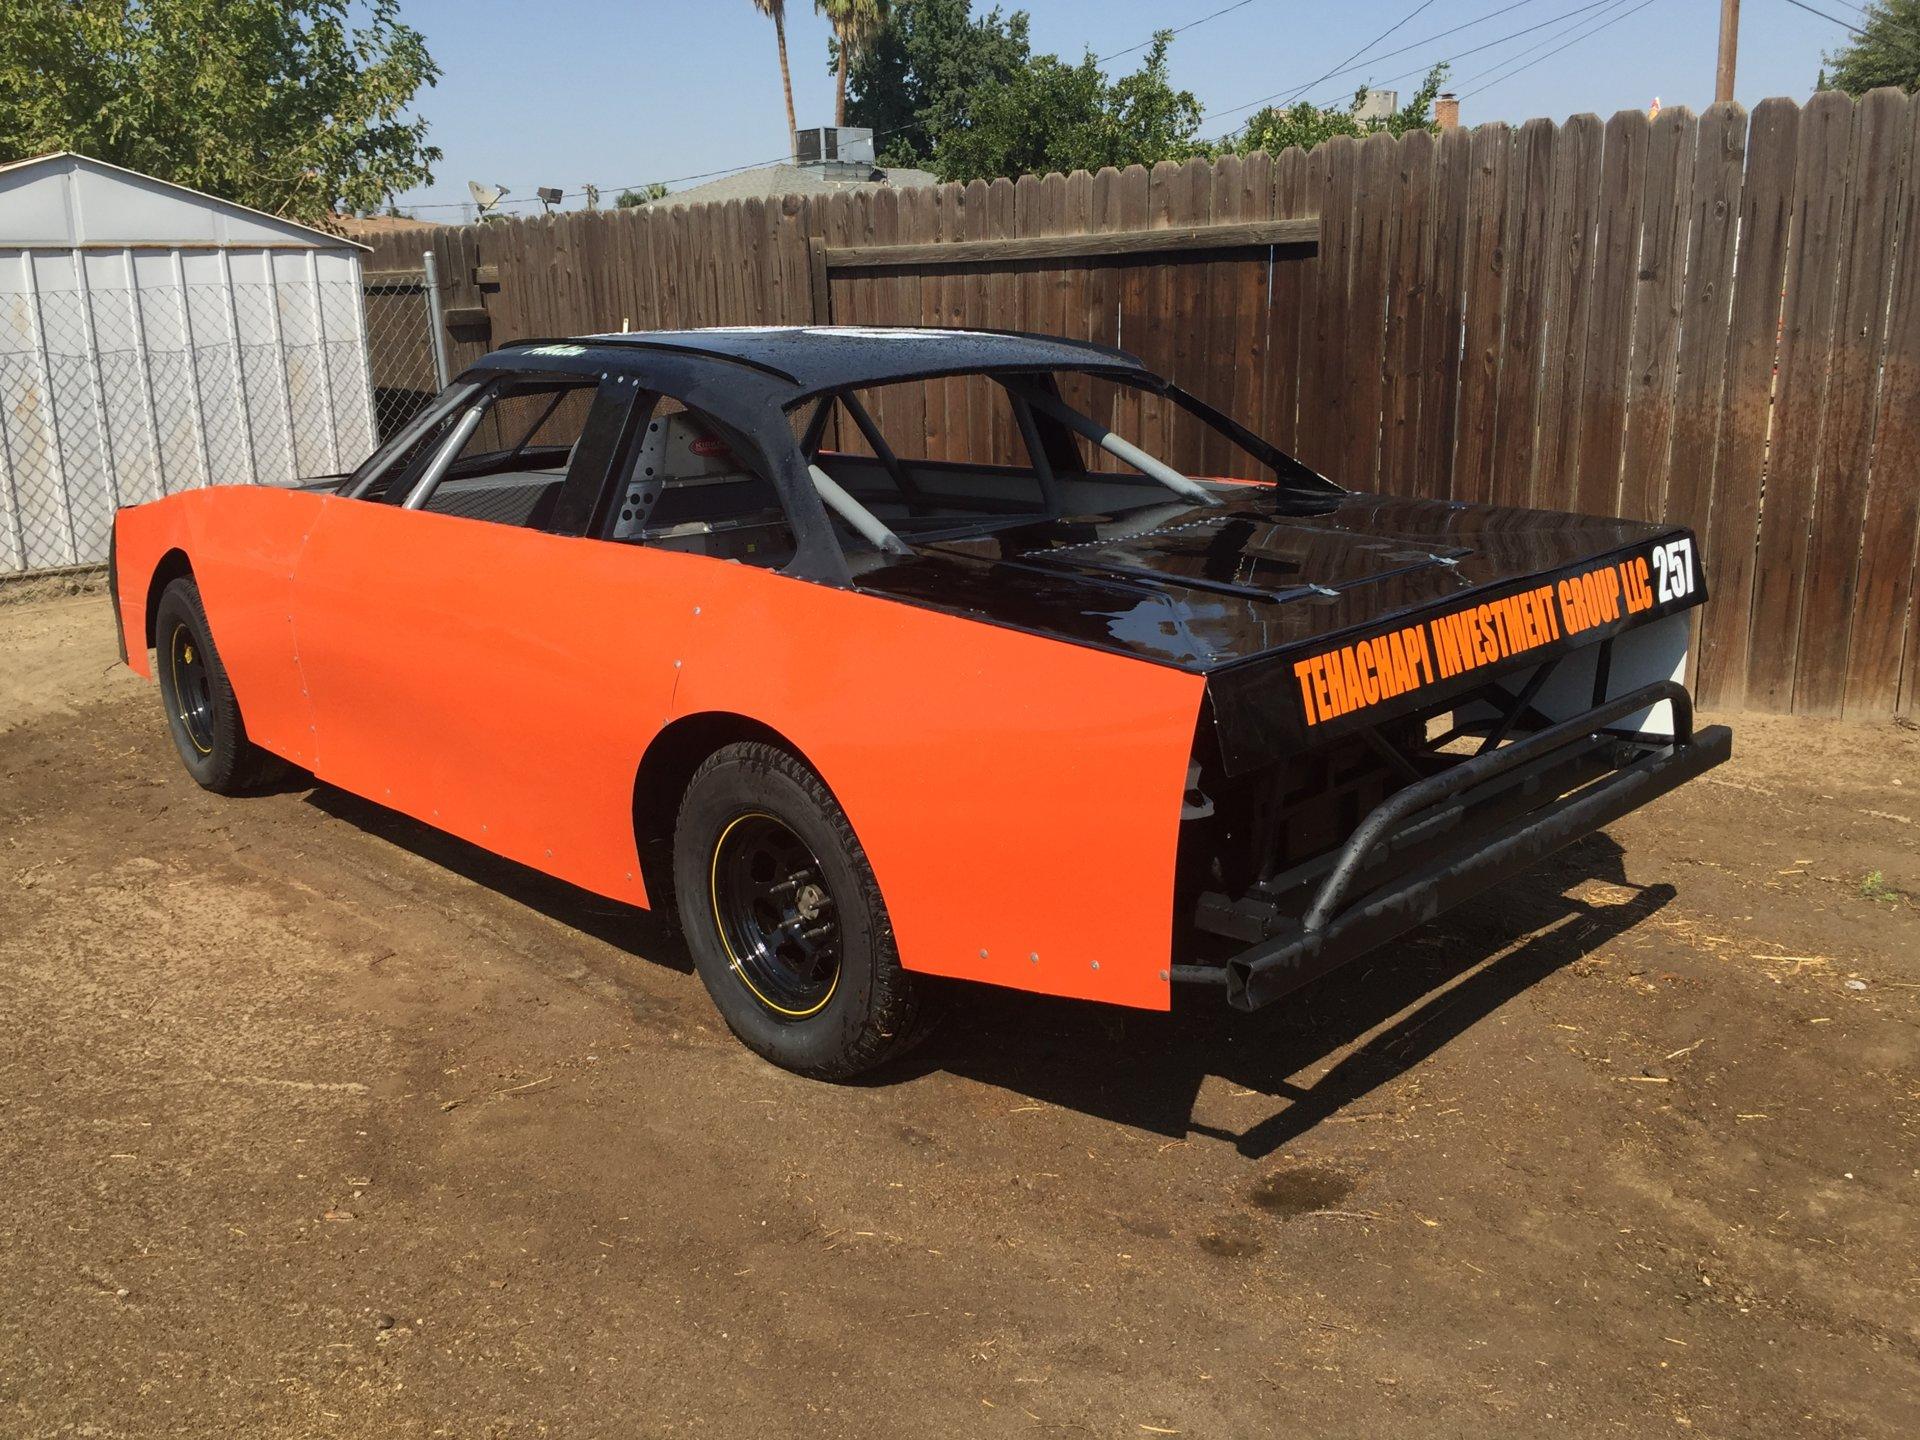 Hobby stock / dirt track / oval track race car | Bloodydecks